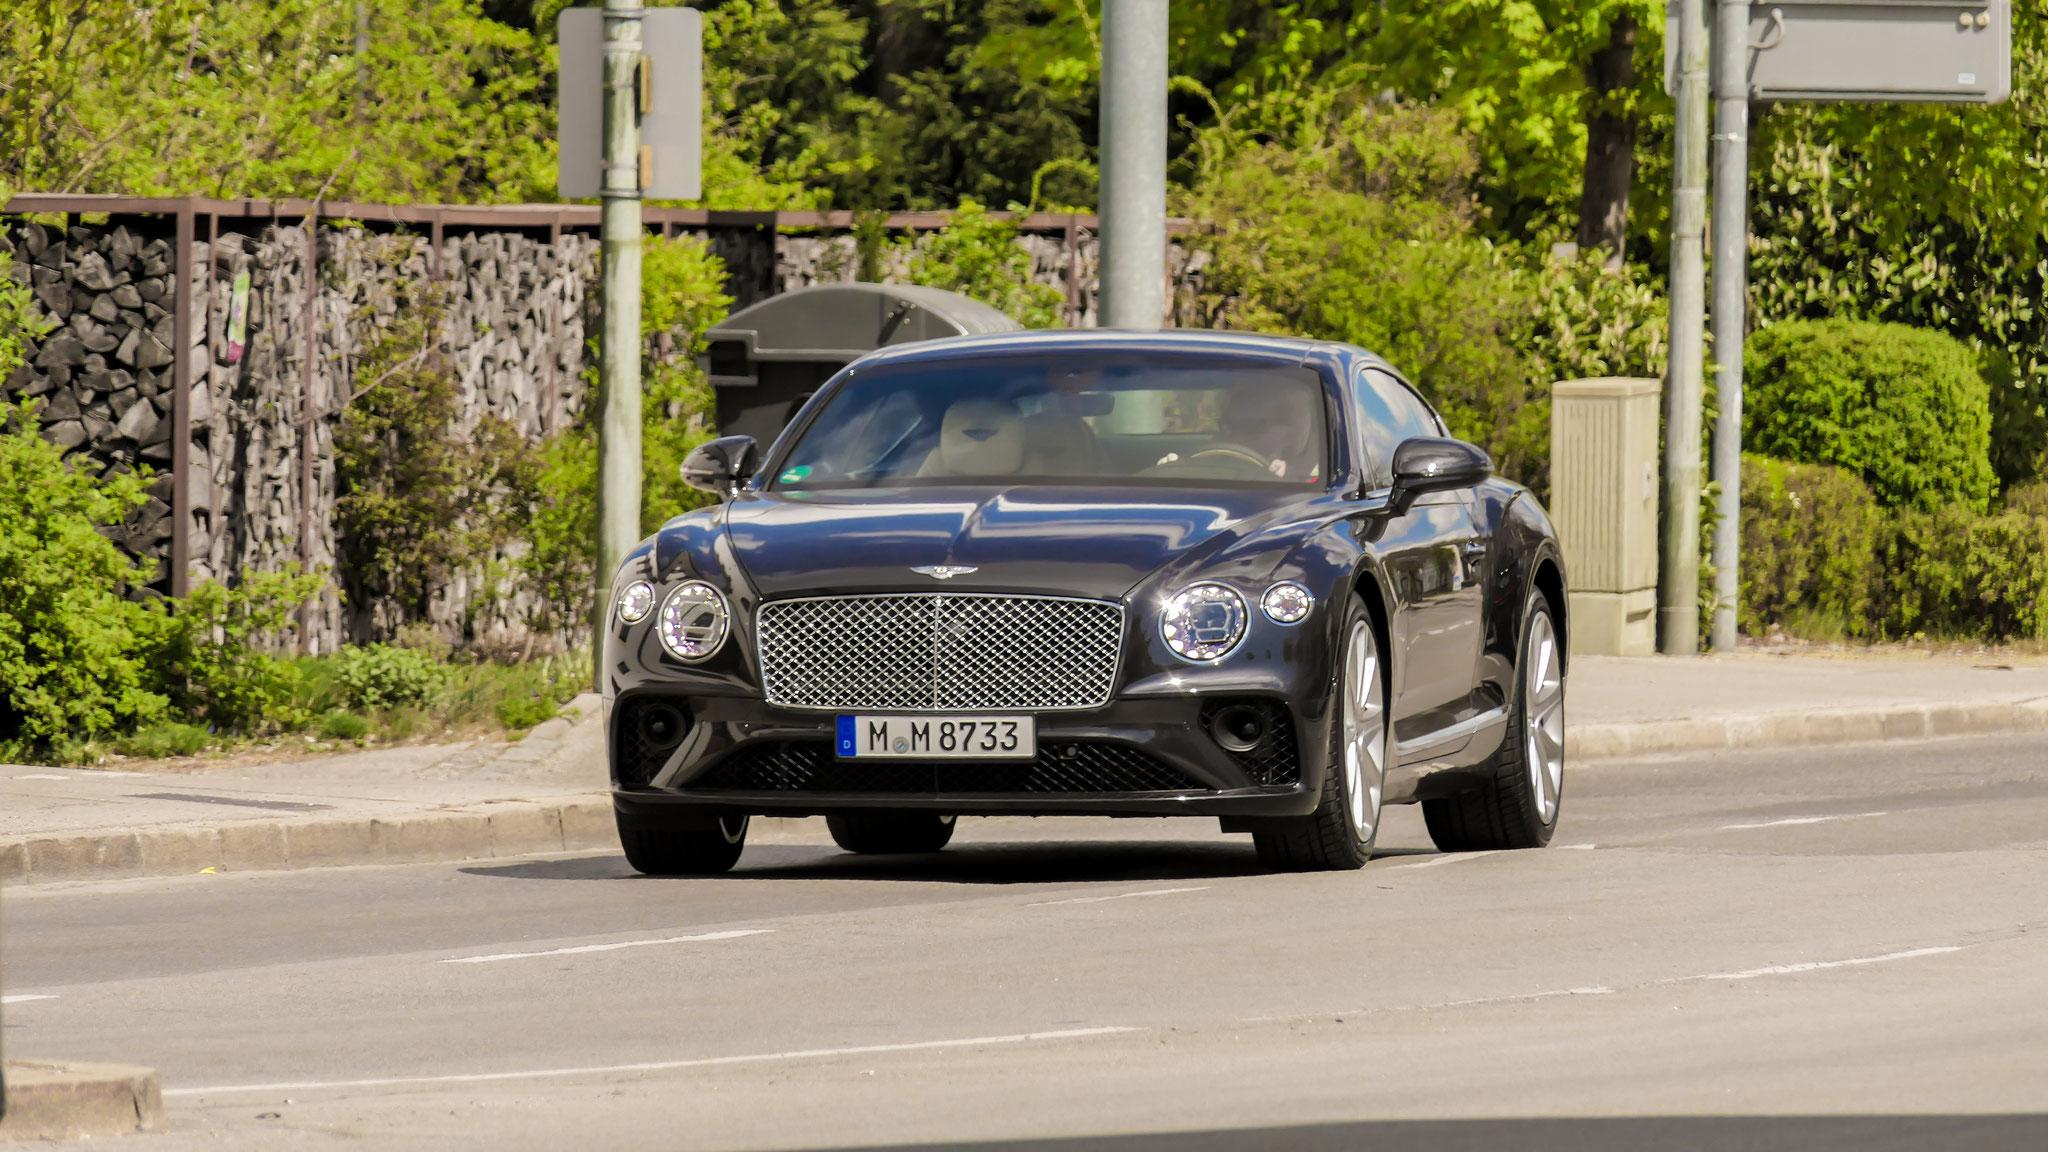 Bentley Continental GT - M-M-8733